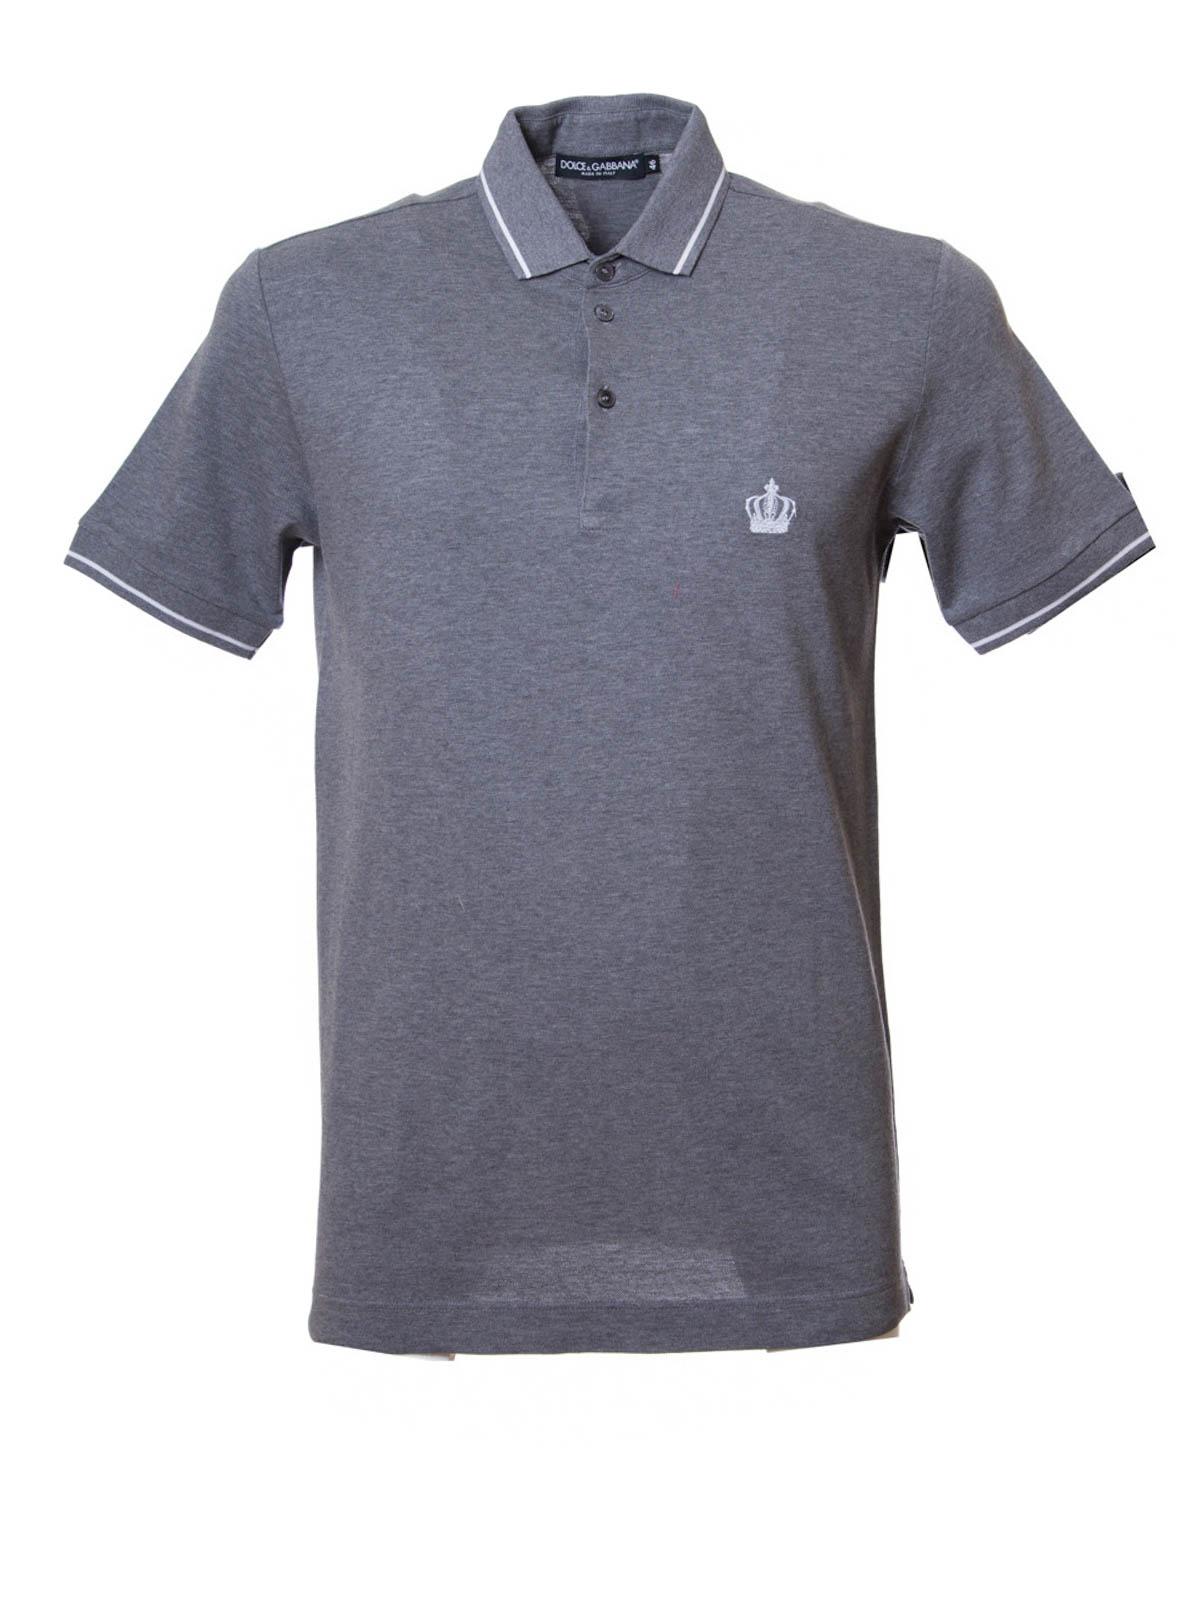 Cotton Polo Shirt By Dolce Gabbana Polo Shirts Ikrix